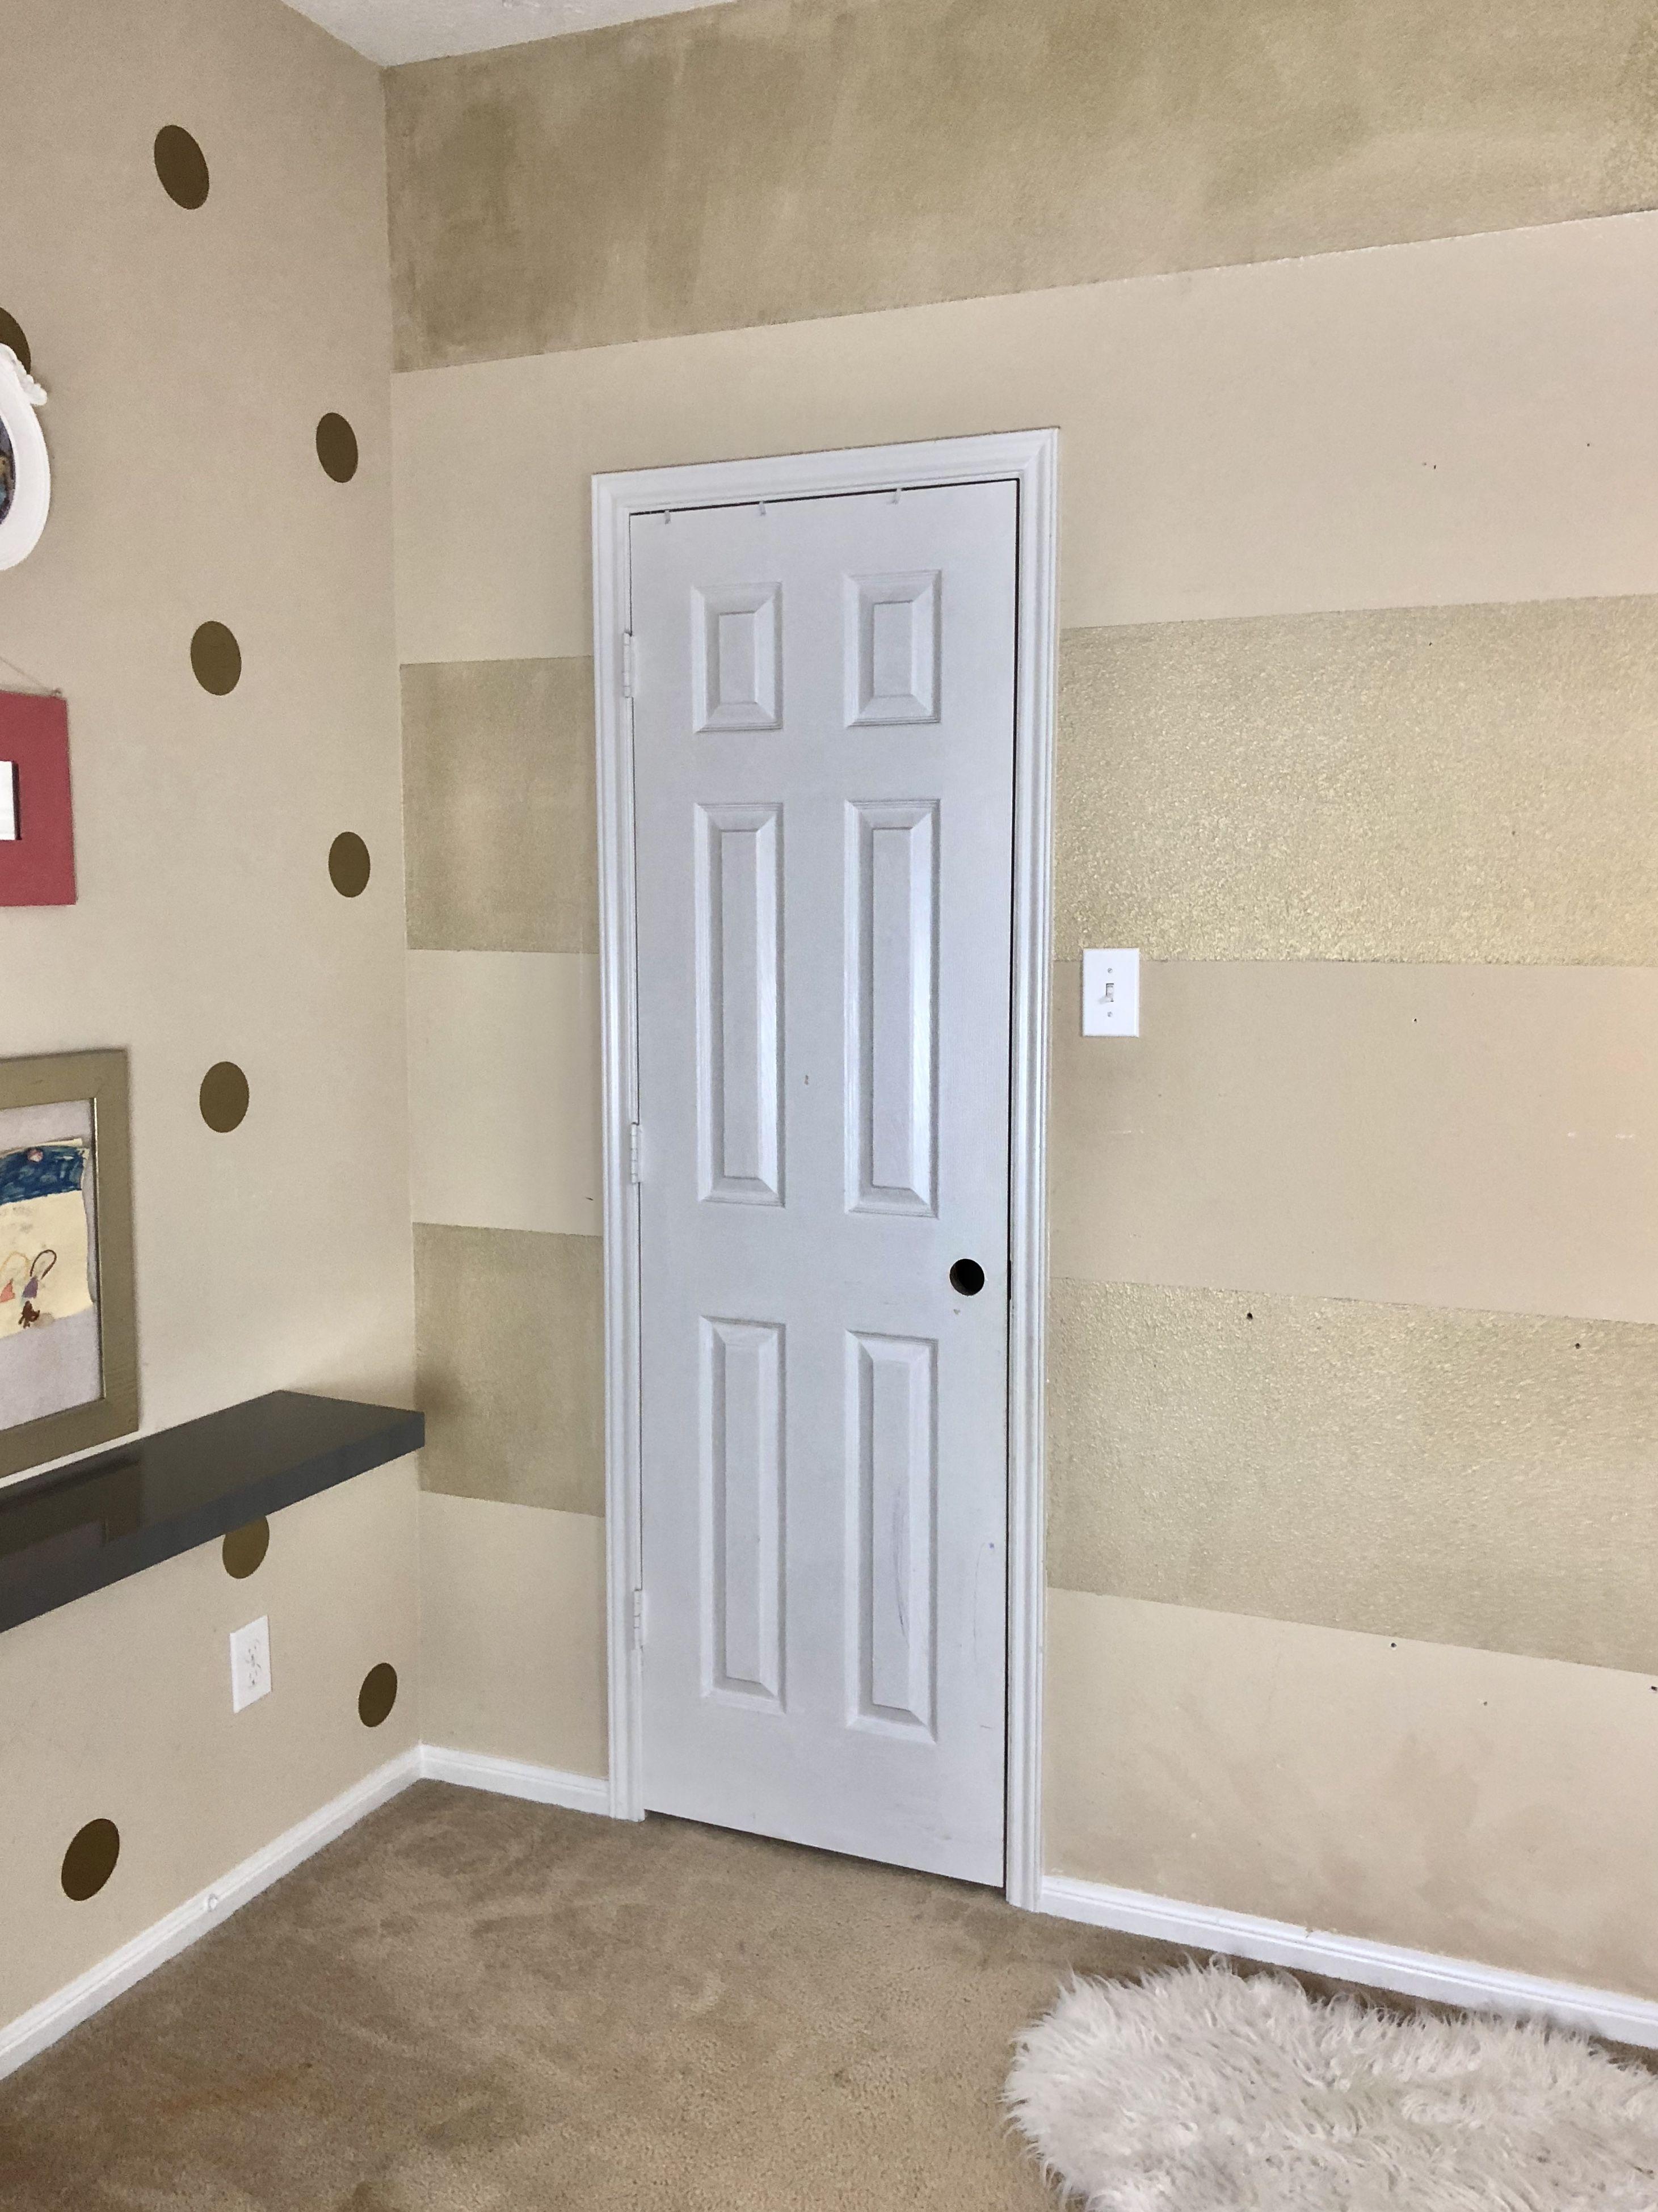 Honest Review Tips For Rustoleum Glitter Paint Gluten Free Glam Girl Interior Wall Paint Glitter Paint For Walls Glitter Paint Bedroom